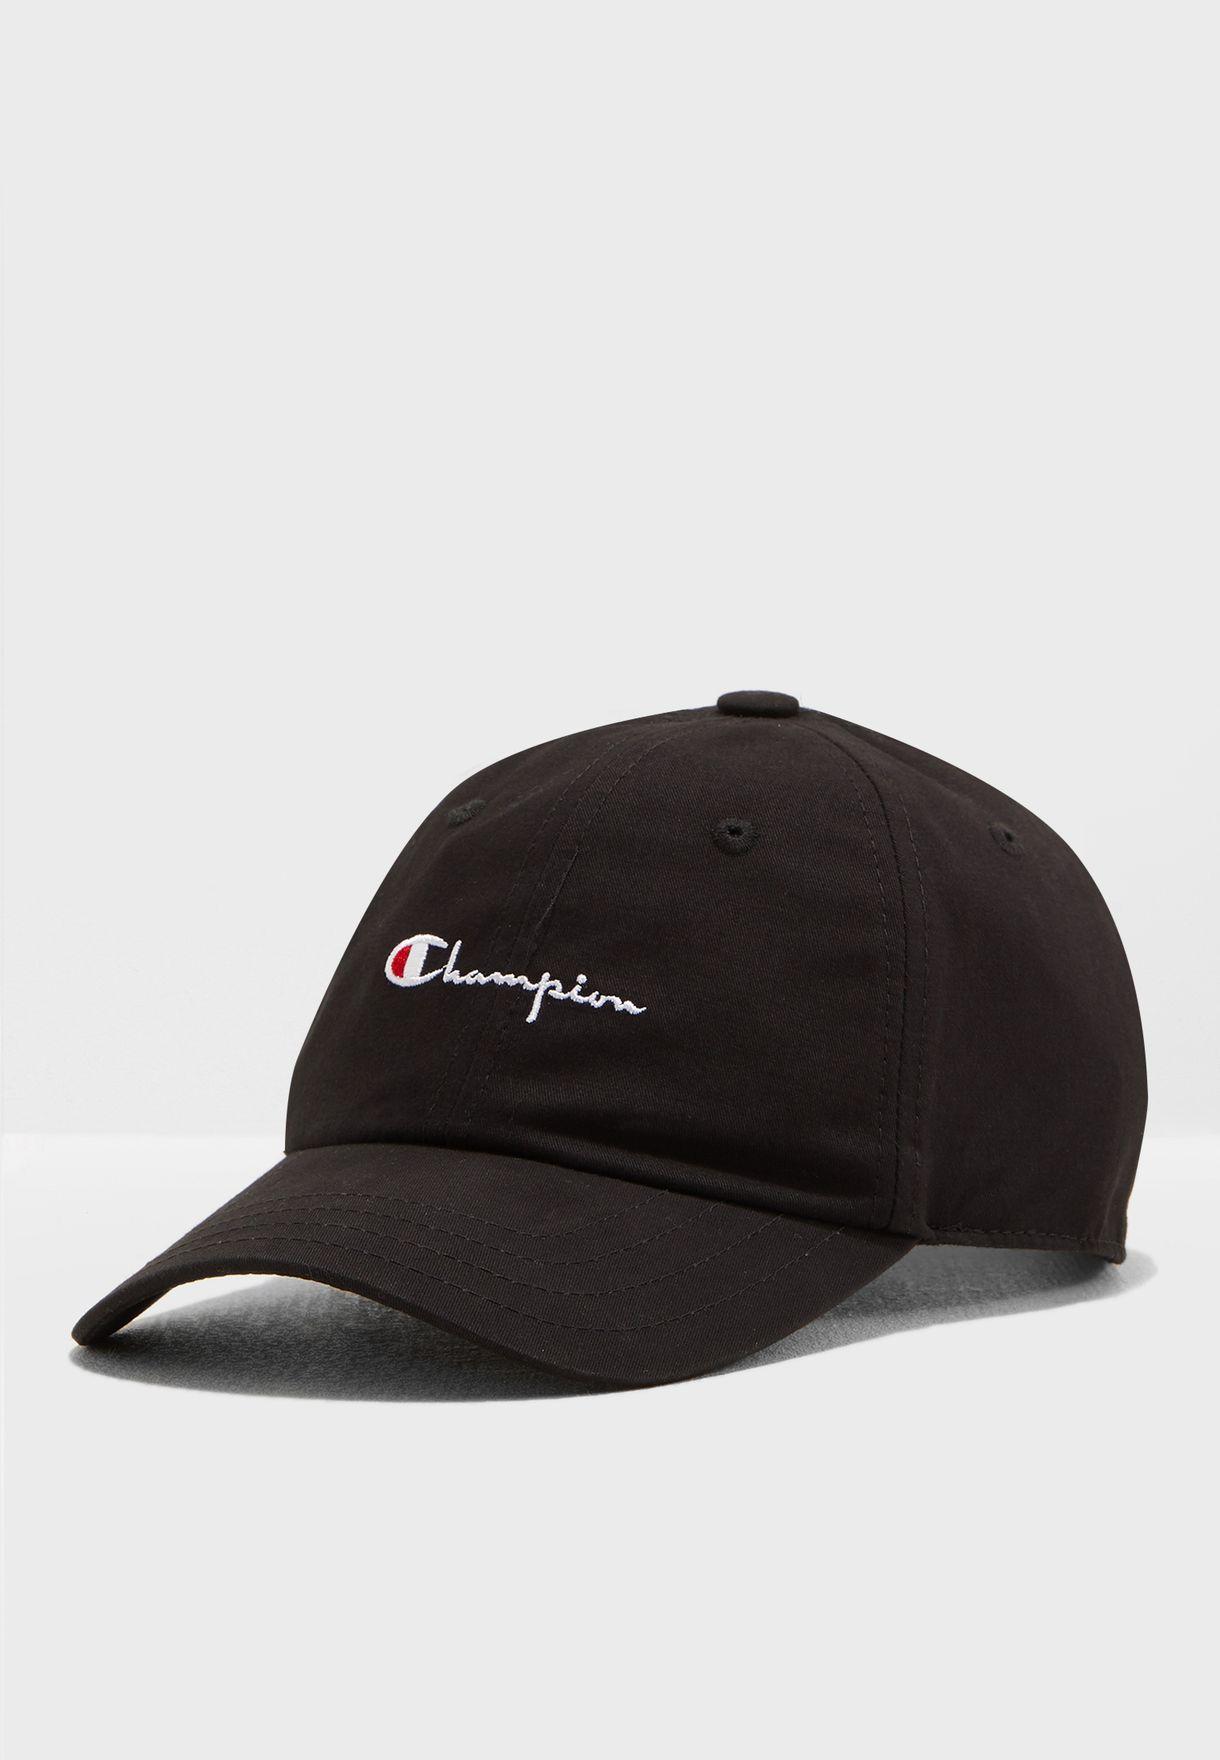 ab80ef93bffd1 Shop Champion black Baseball Cap 804549-KK001 for Men in Saudi -  13352AC82POP